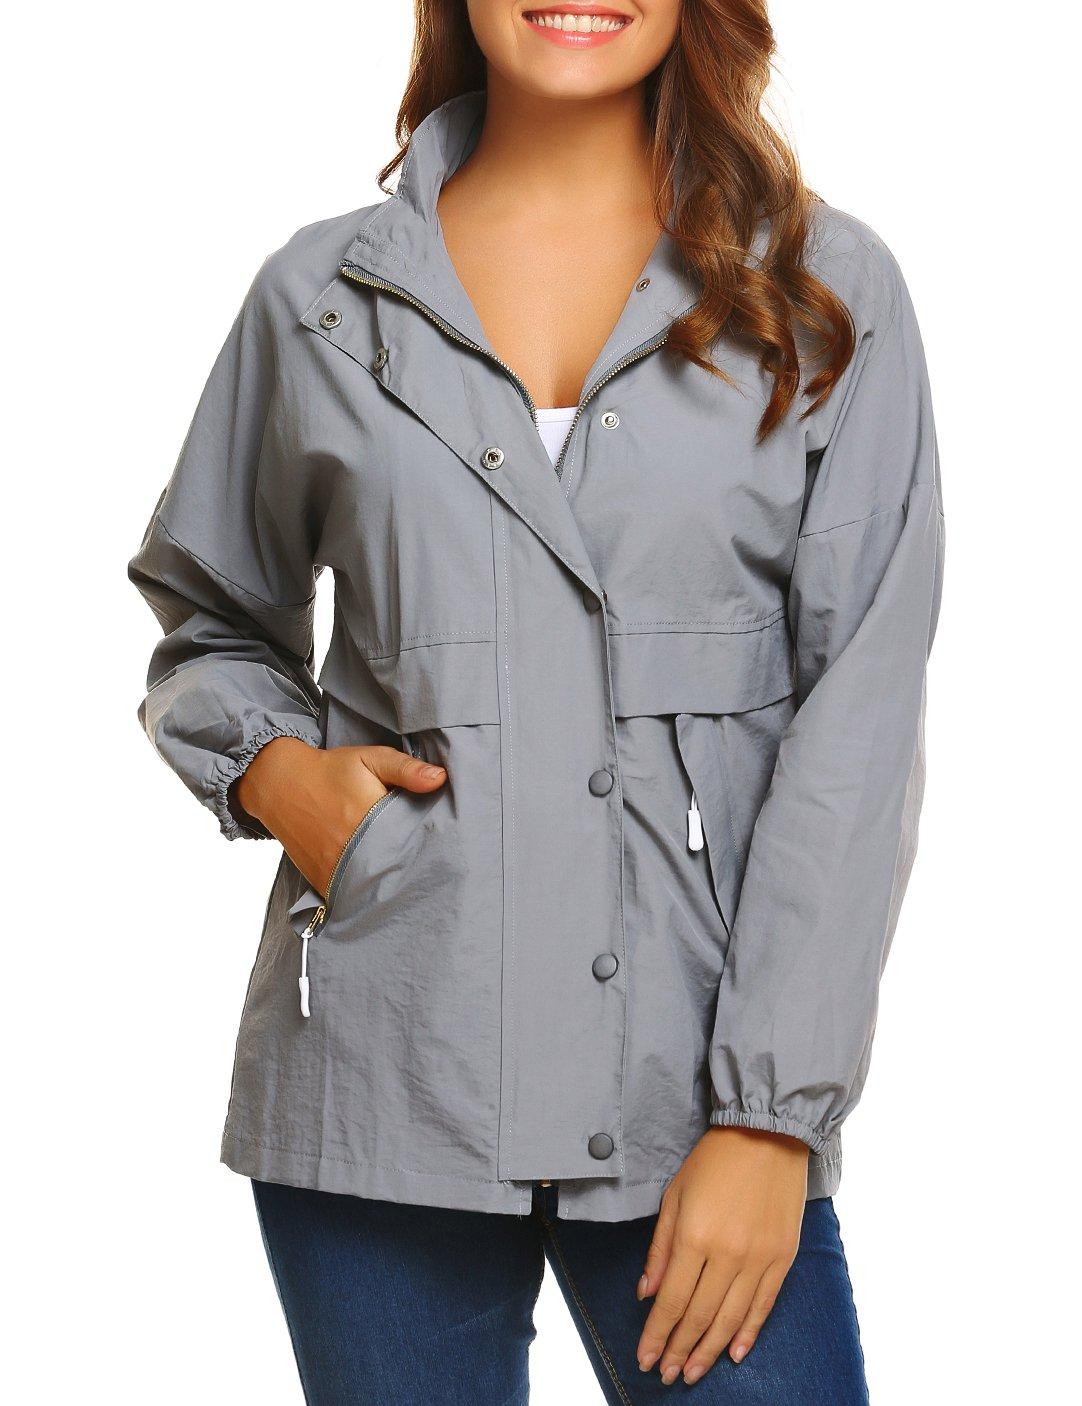 SE MIU Women's Lightweight Waterproof Raincoat With Pocket Outdoor Rain Jacket (Grey, XL)